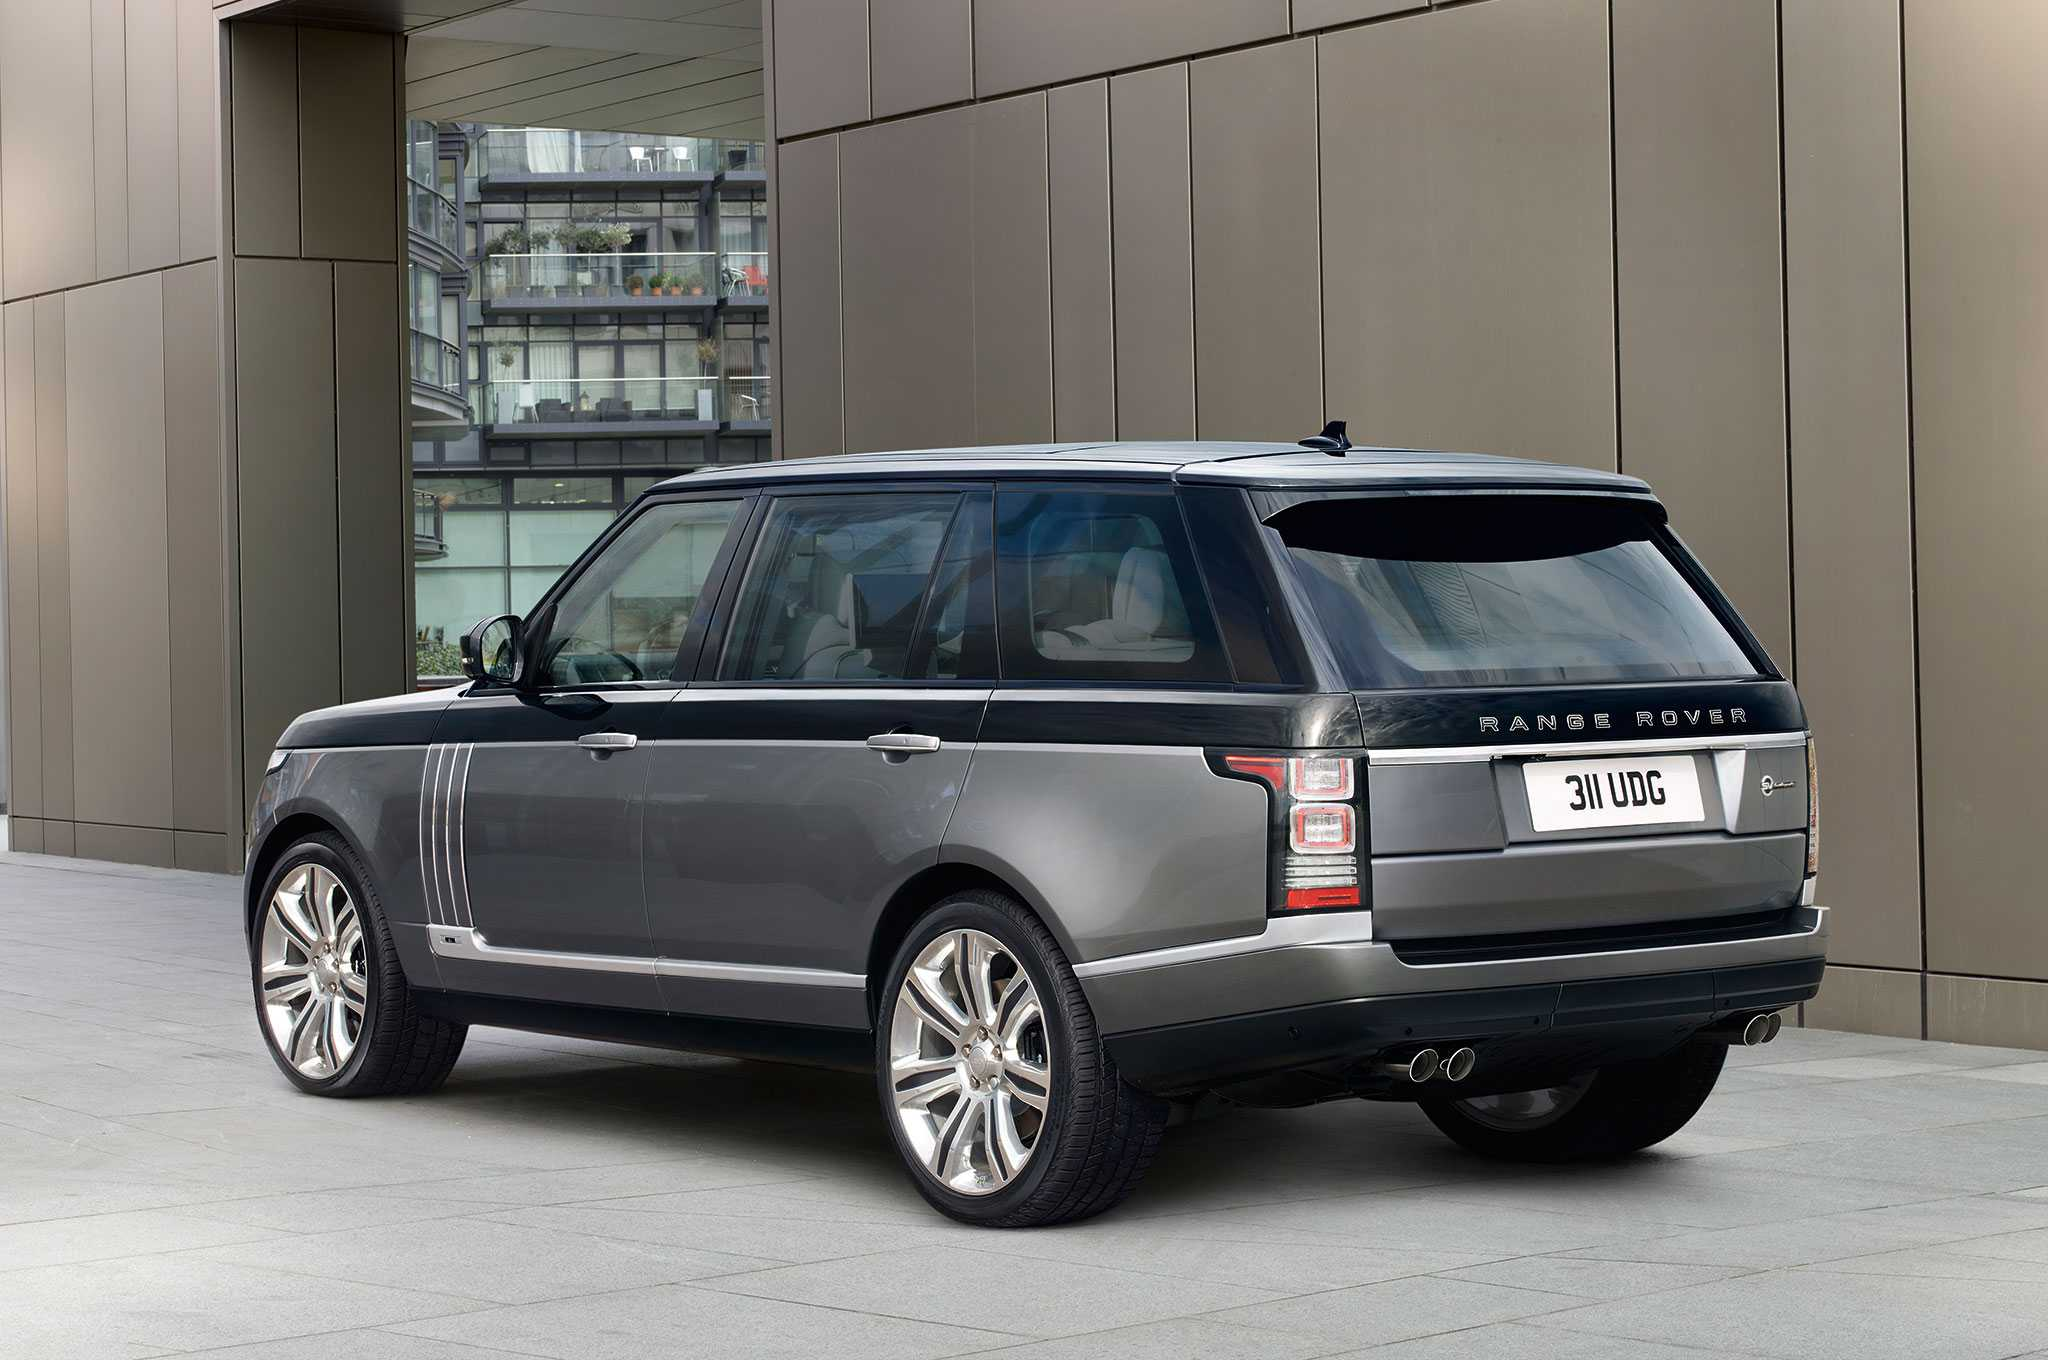 2016 Land Rover Range Rover SVAutobiography Nashville Chatter